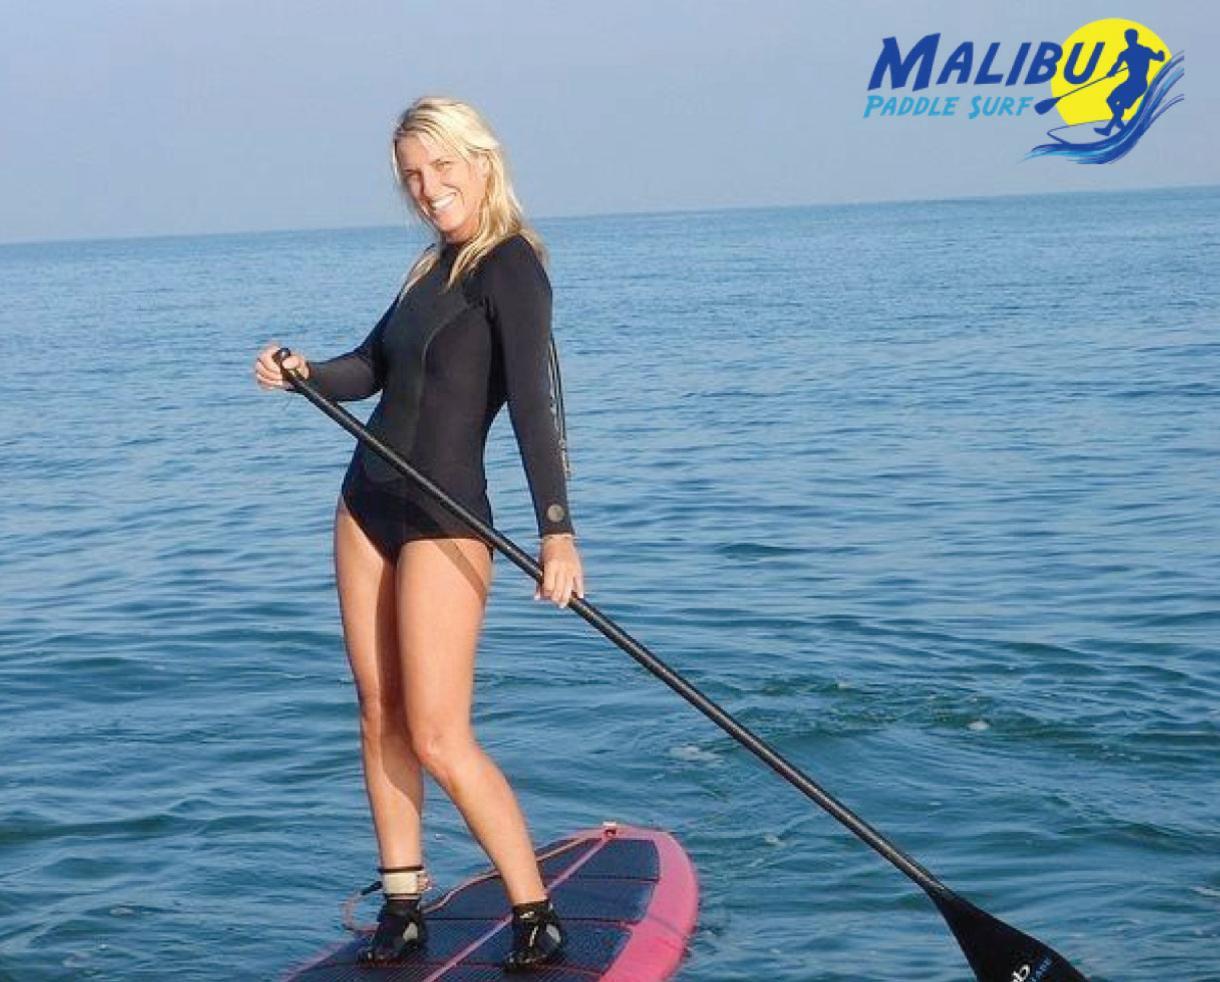 Standup-Paddleboard Rental or Lessons at Malibu Paddle Surf